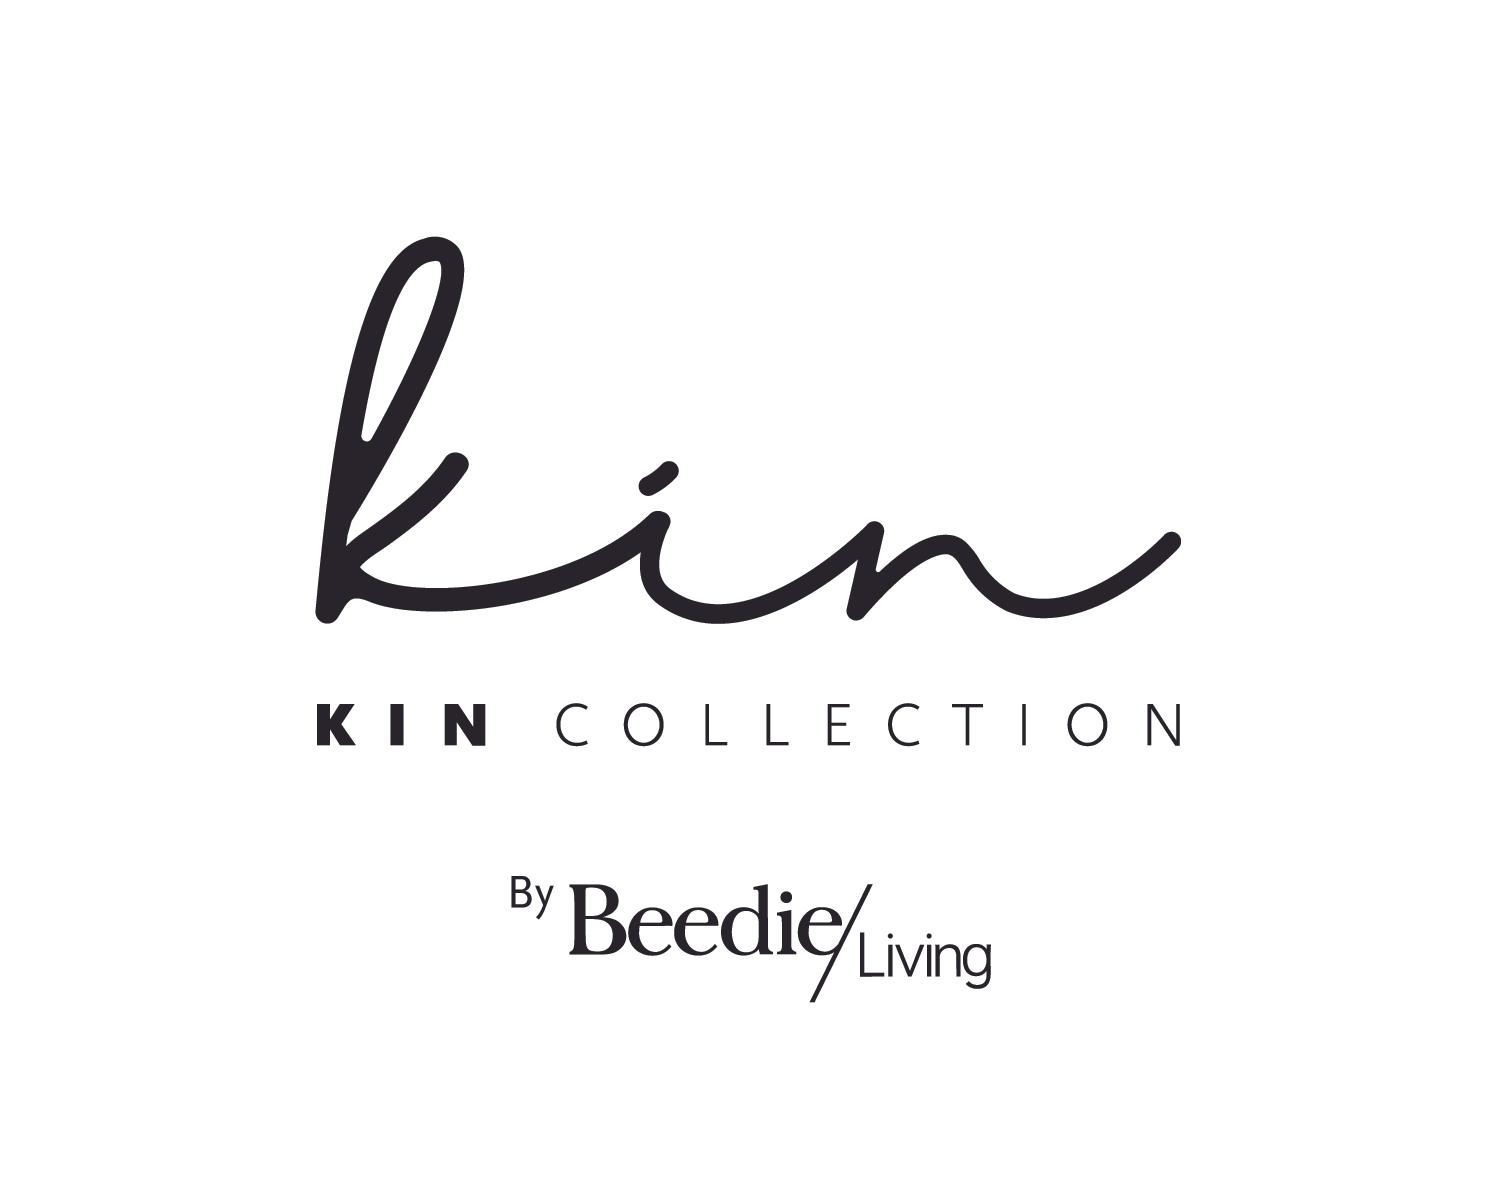 Kin_Beedie_Blk_Logo.tif